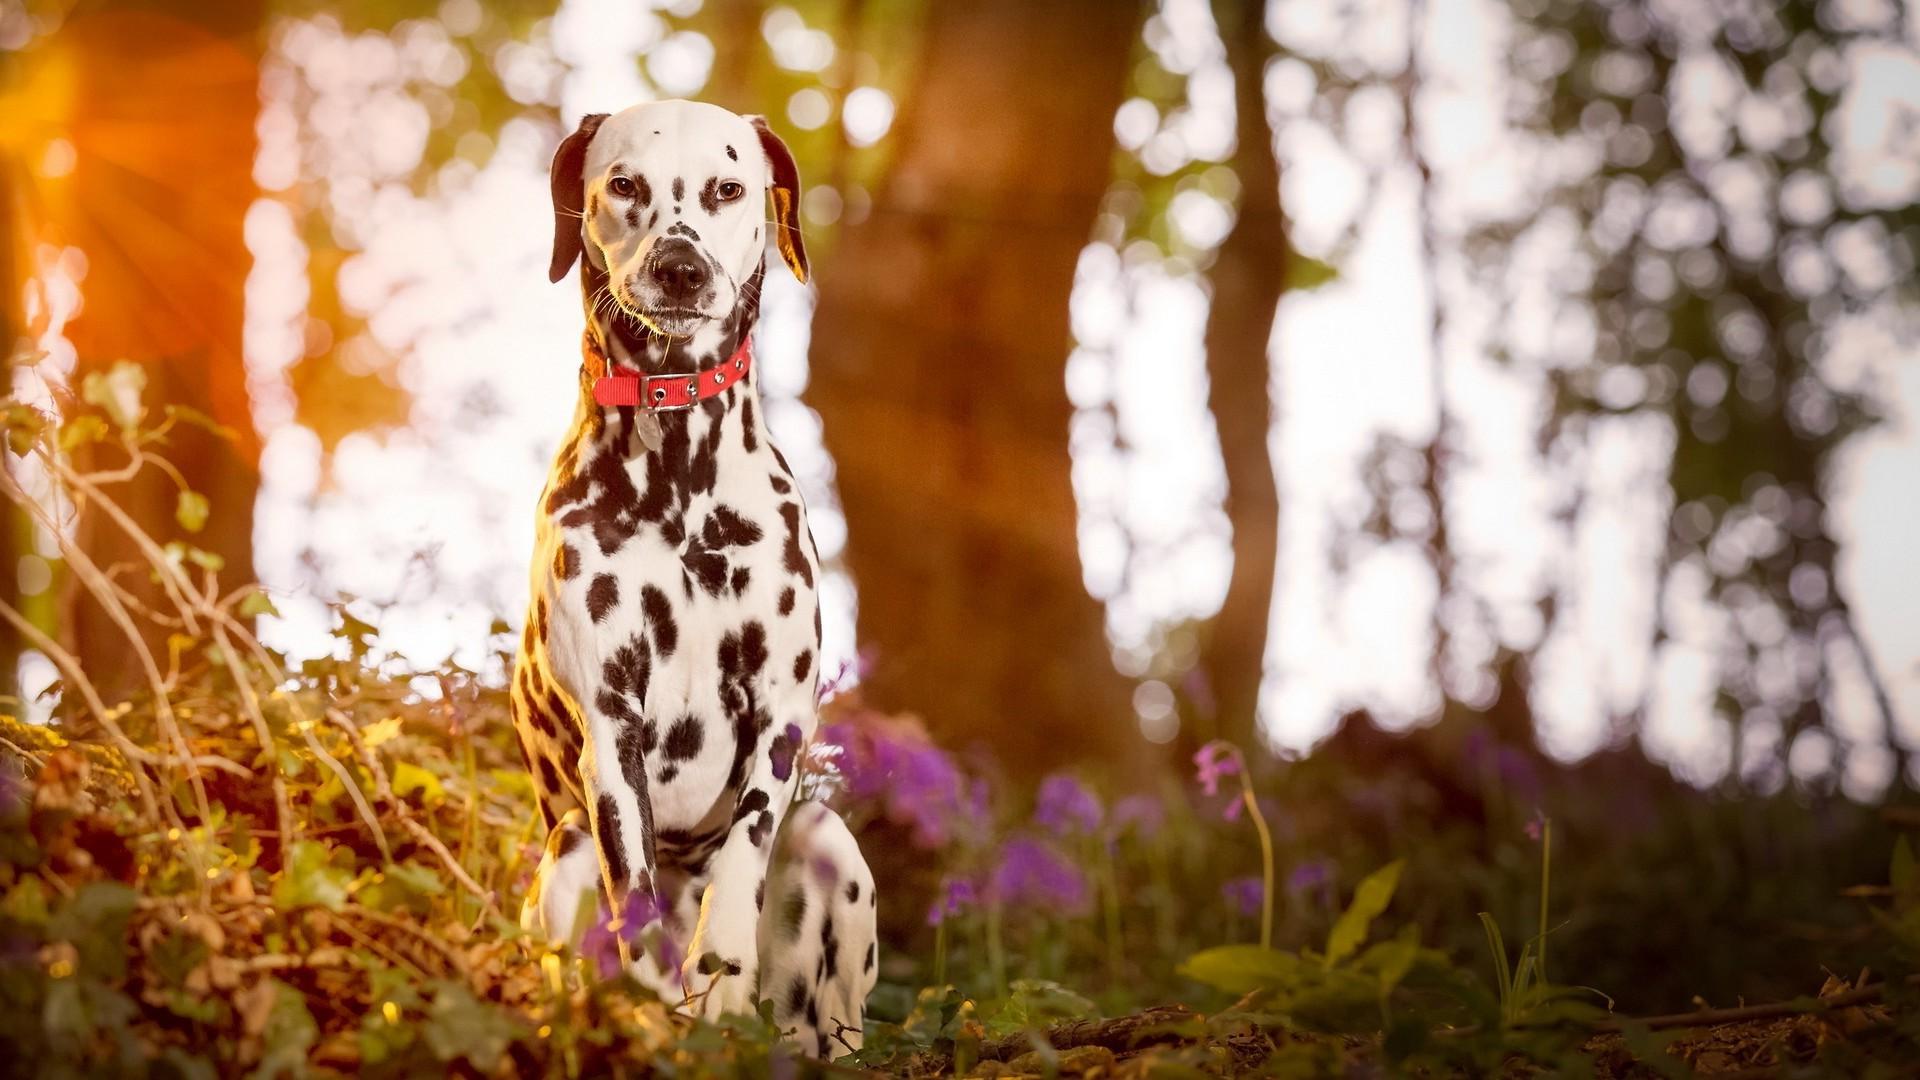 1920x1080 Px Animals Dalmatian Depth Of Field Dog Sunlight